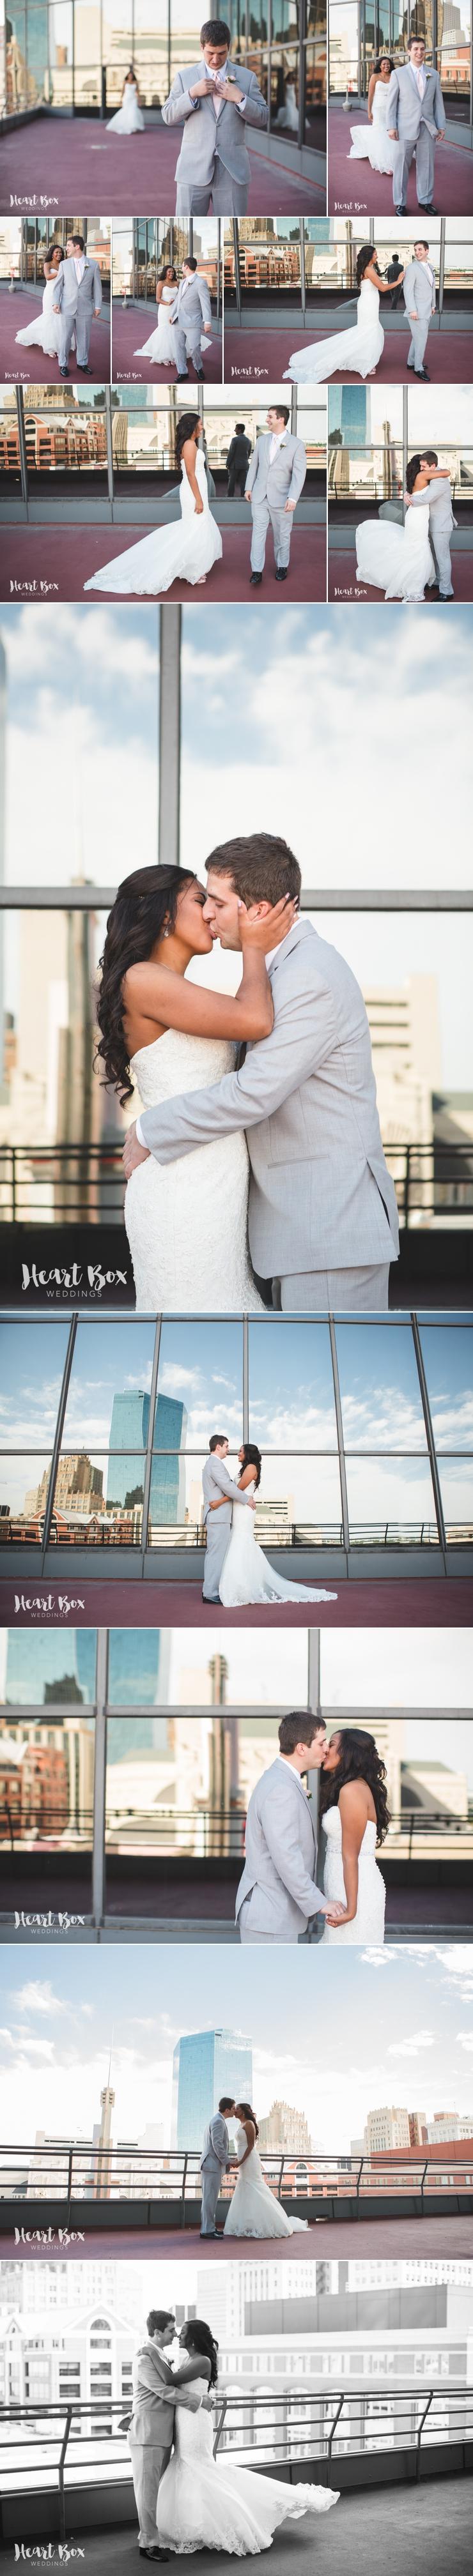 Smith Wedding Blog Collages 5.jpg